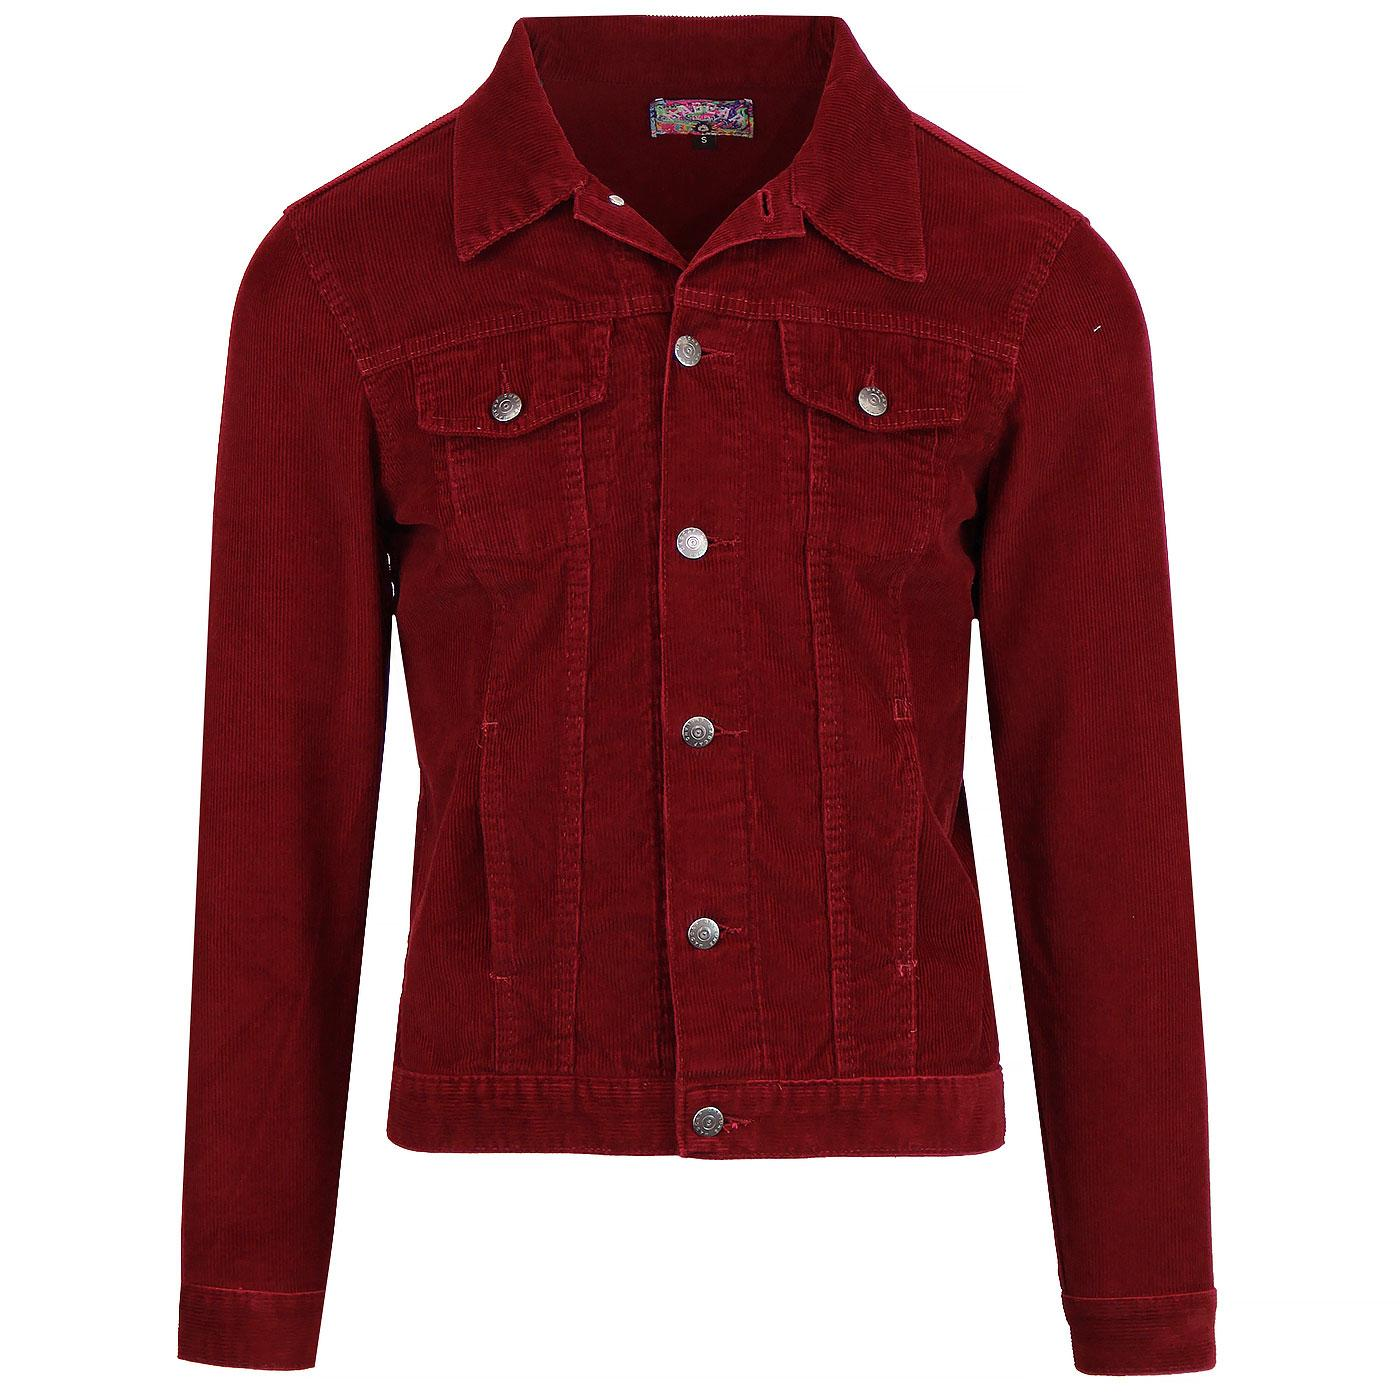 Woburn MADCAP ENGLAND Mod Cord Western Jacket (TP)